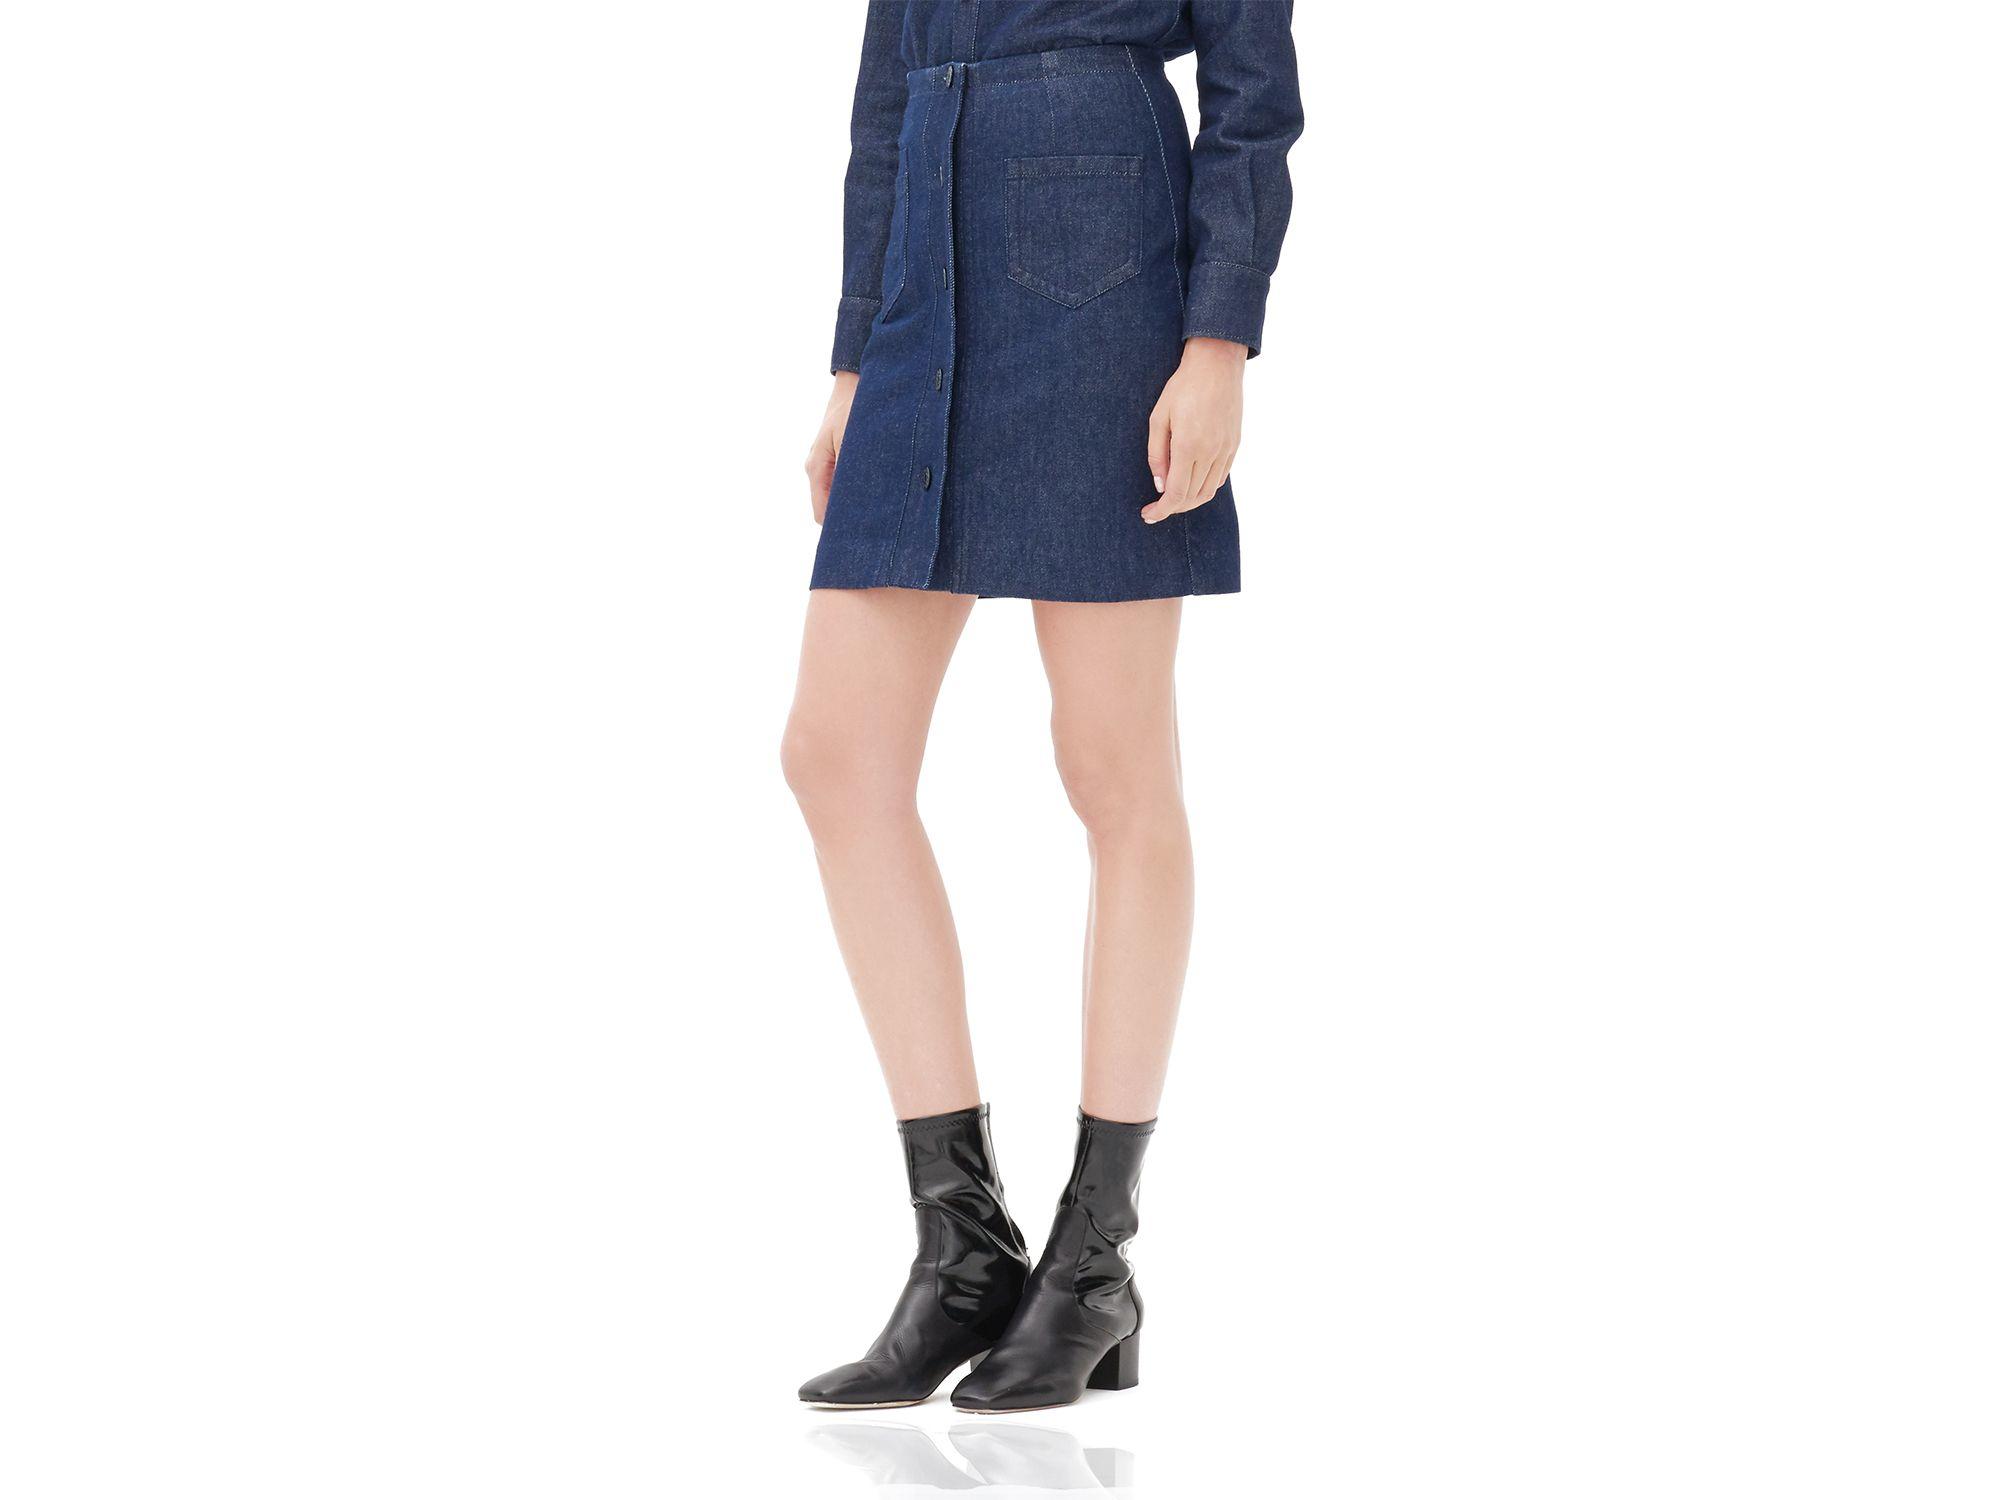 b29f0ae909 Sandro Jasmina Denim Skirt in Blue - Lyst